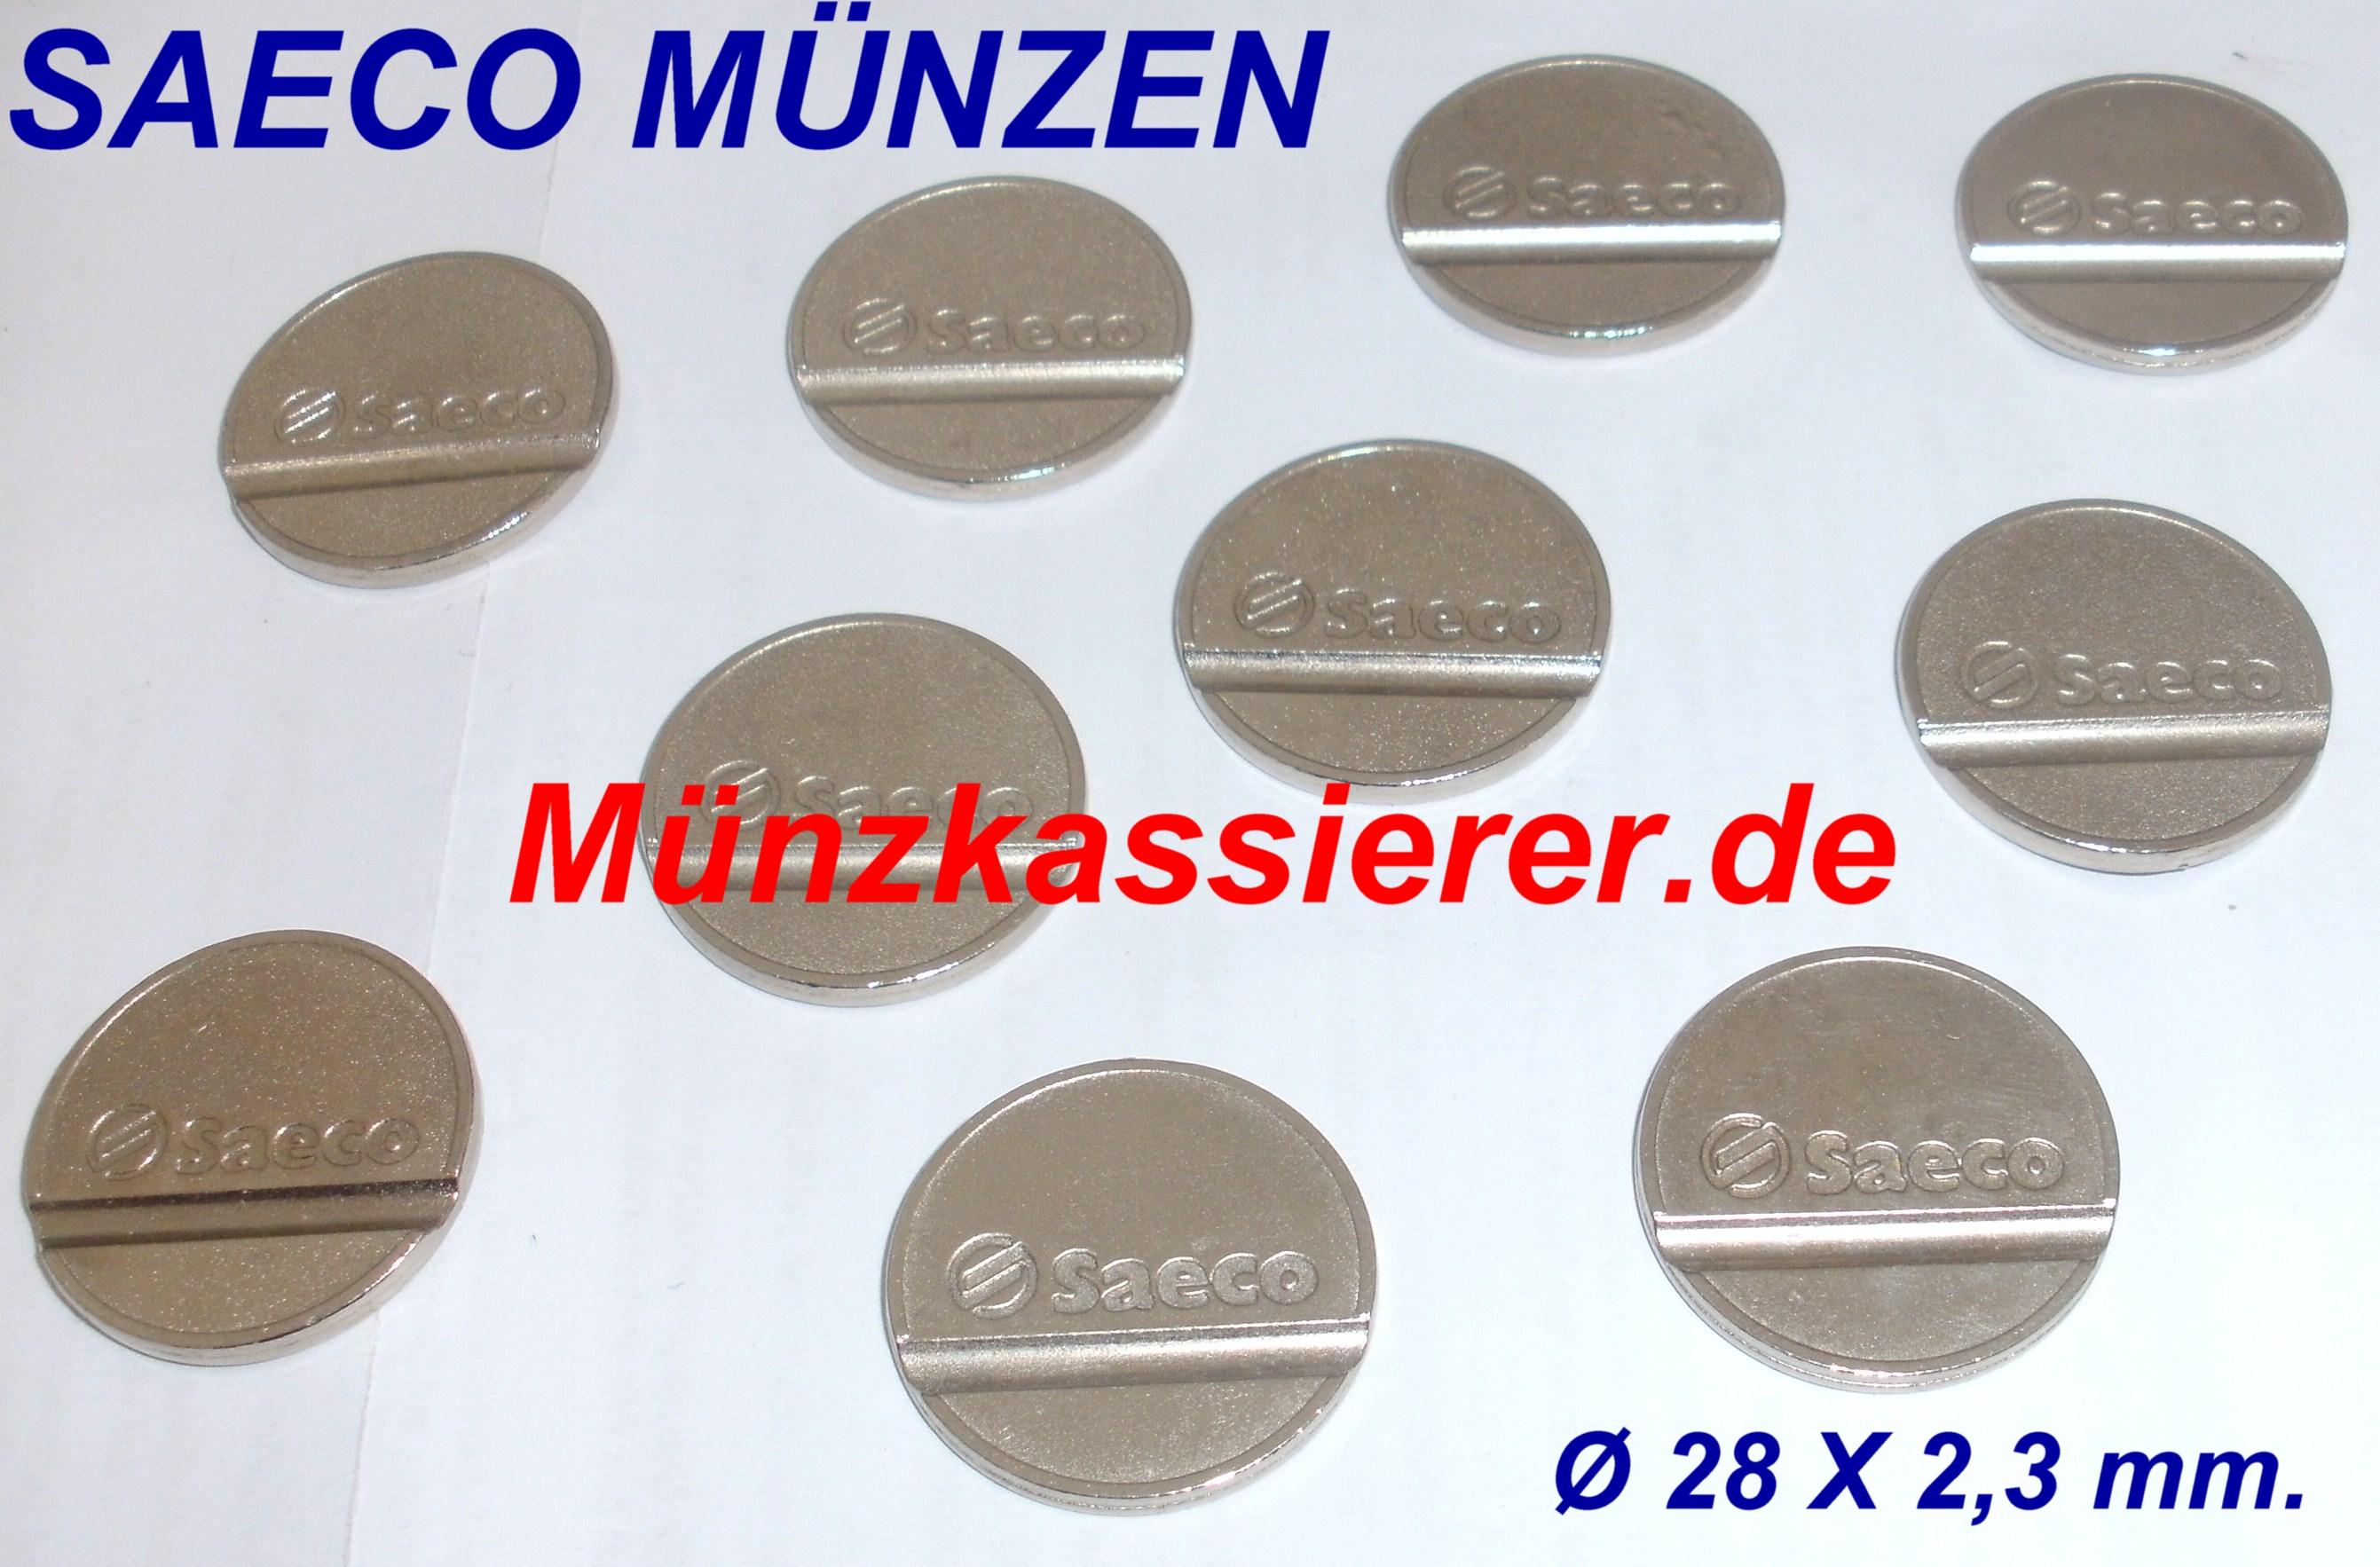 SAECO MÜNZEN Ø 28 x 2,3mm. Münzkassierer.de Saeco Kaffeemaschine